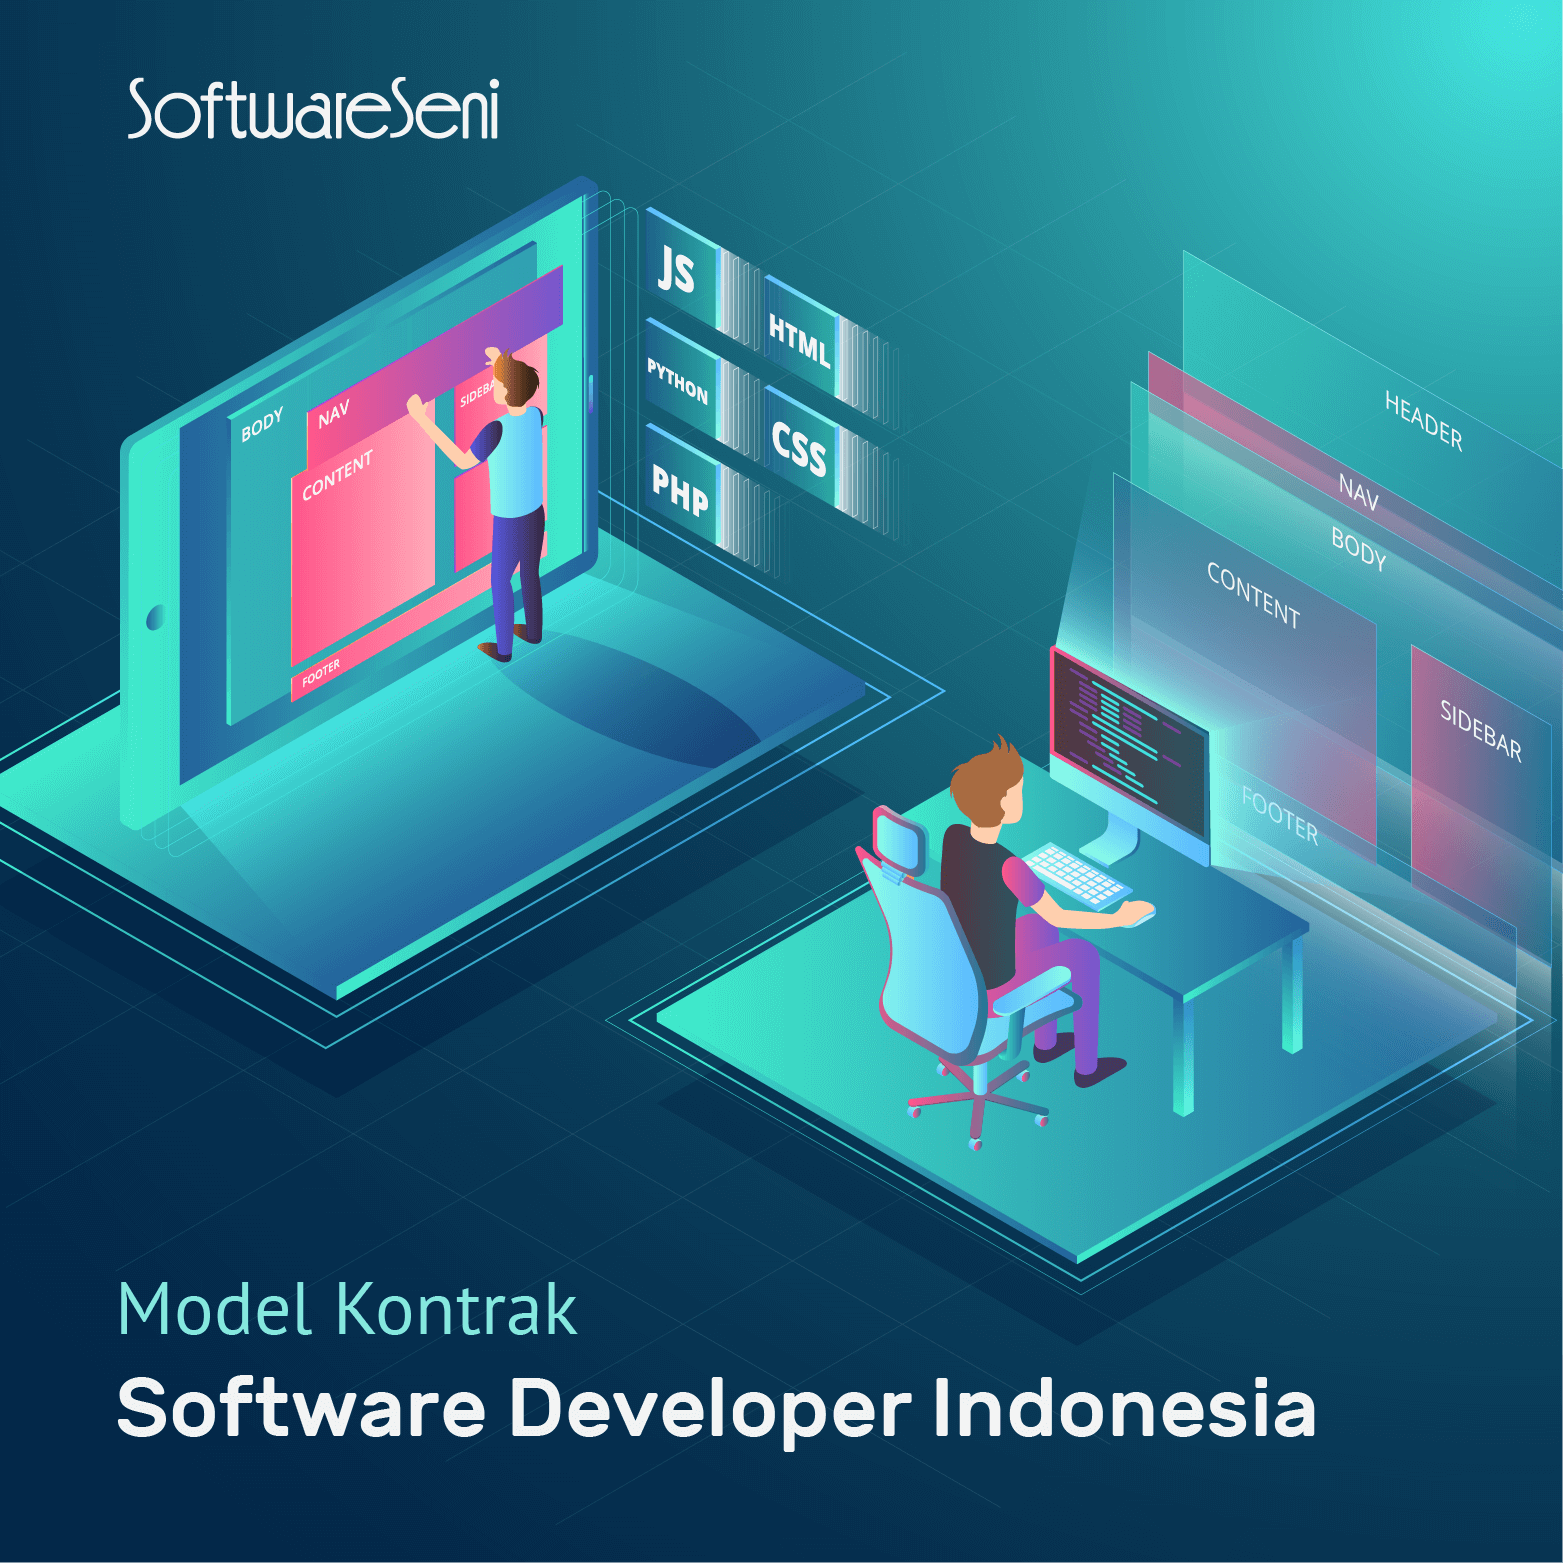 3 Model Kontrak Software Developer Indonesia